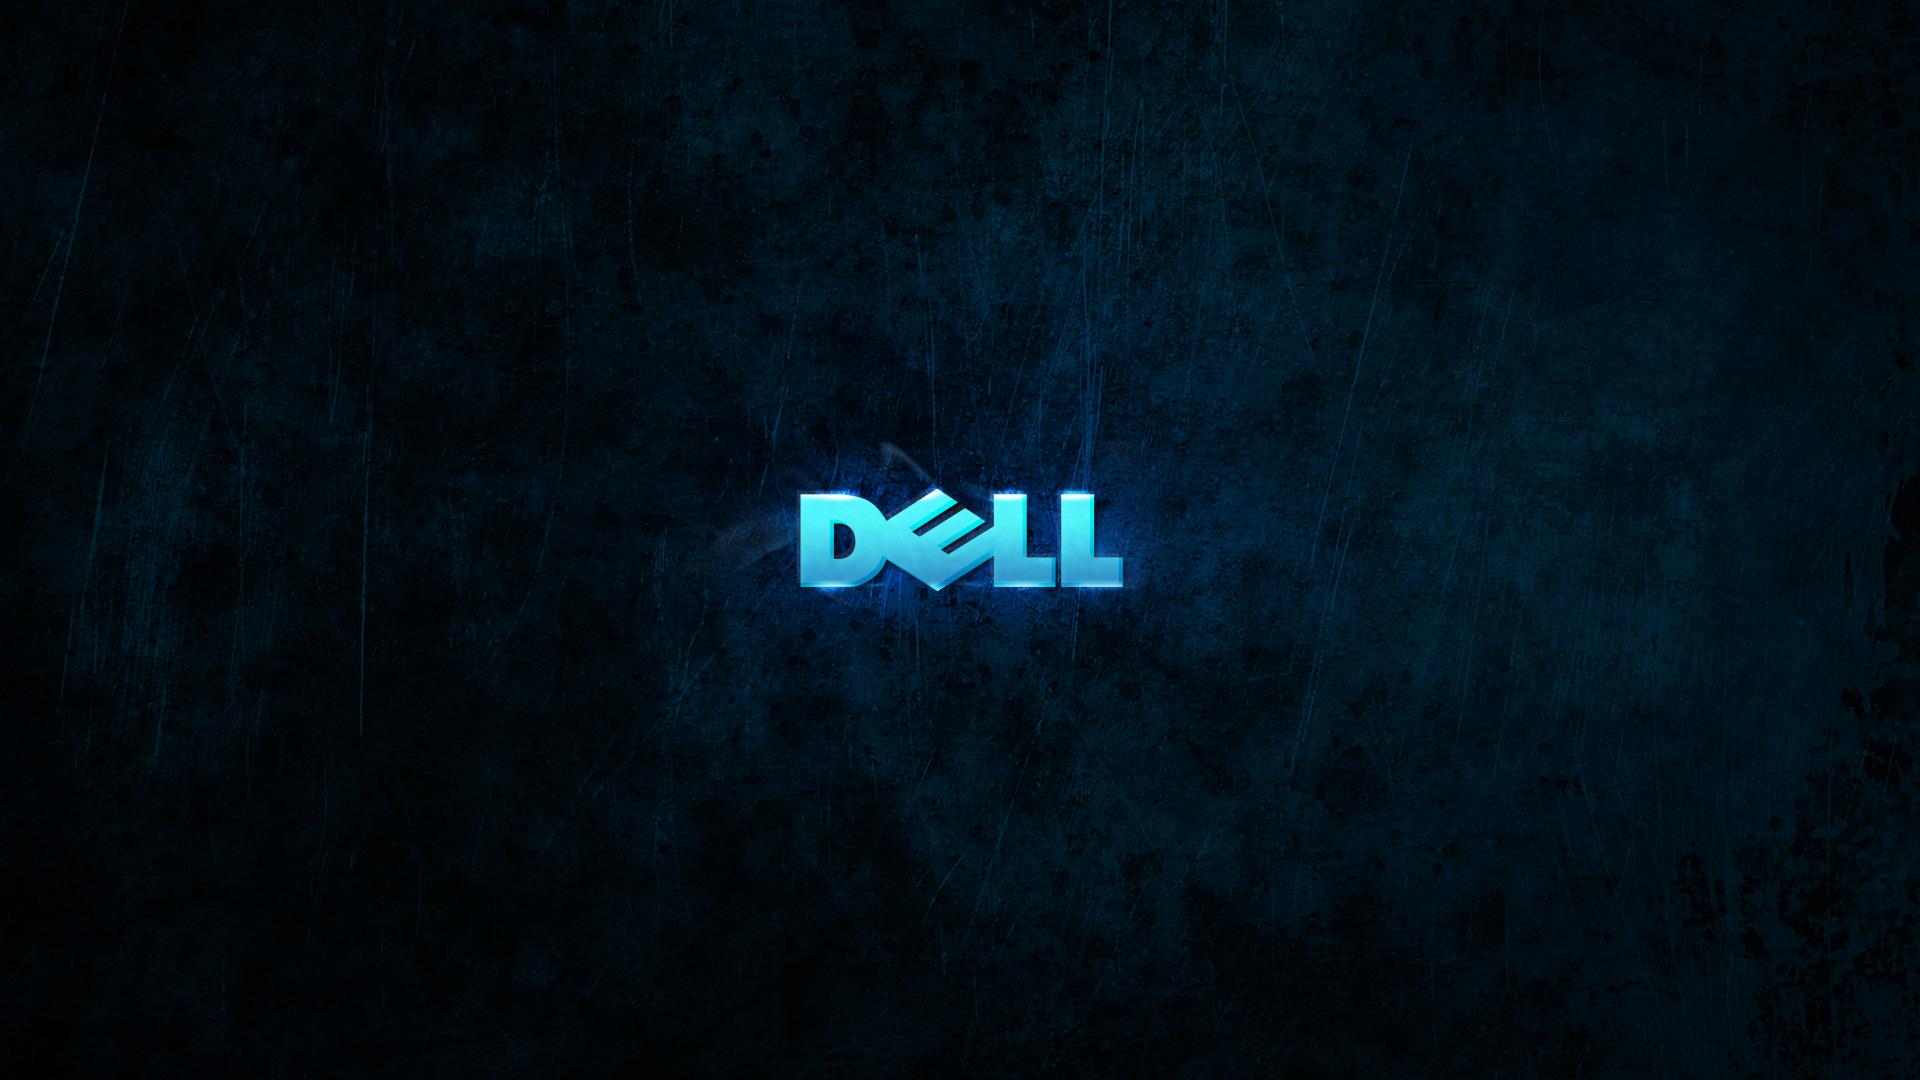 Free Dell Wallpaper